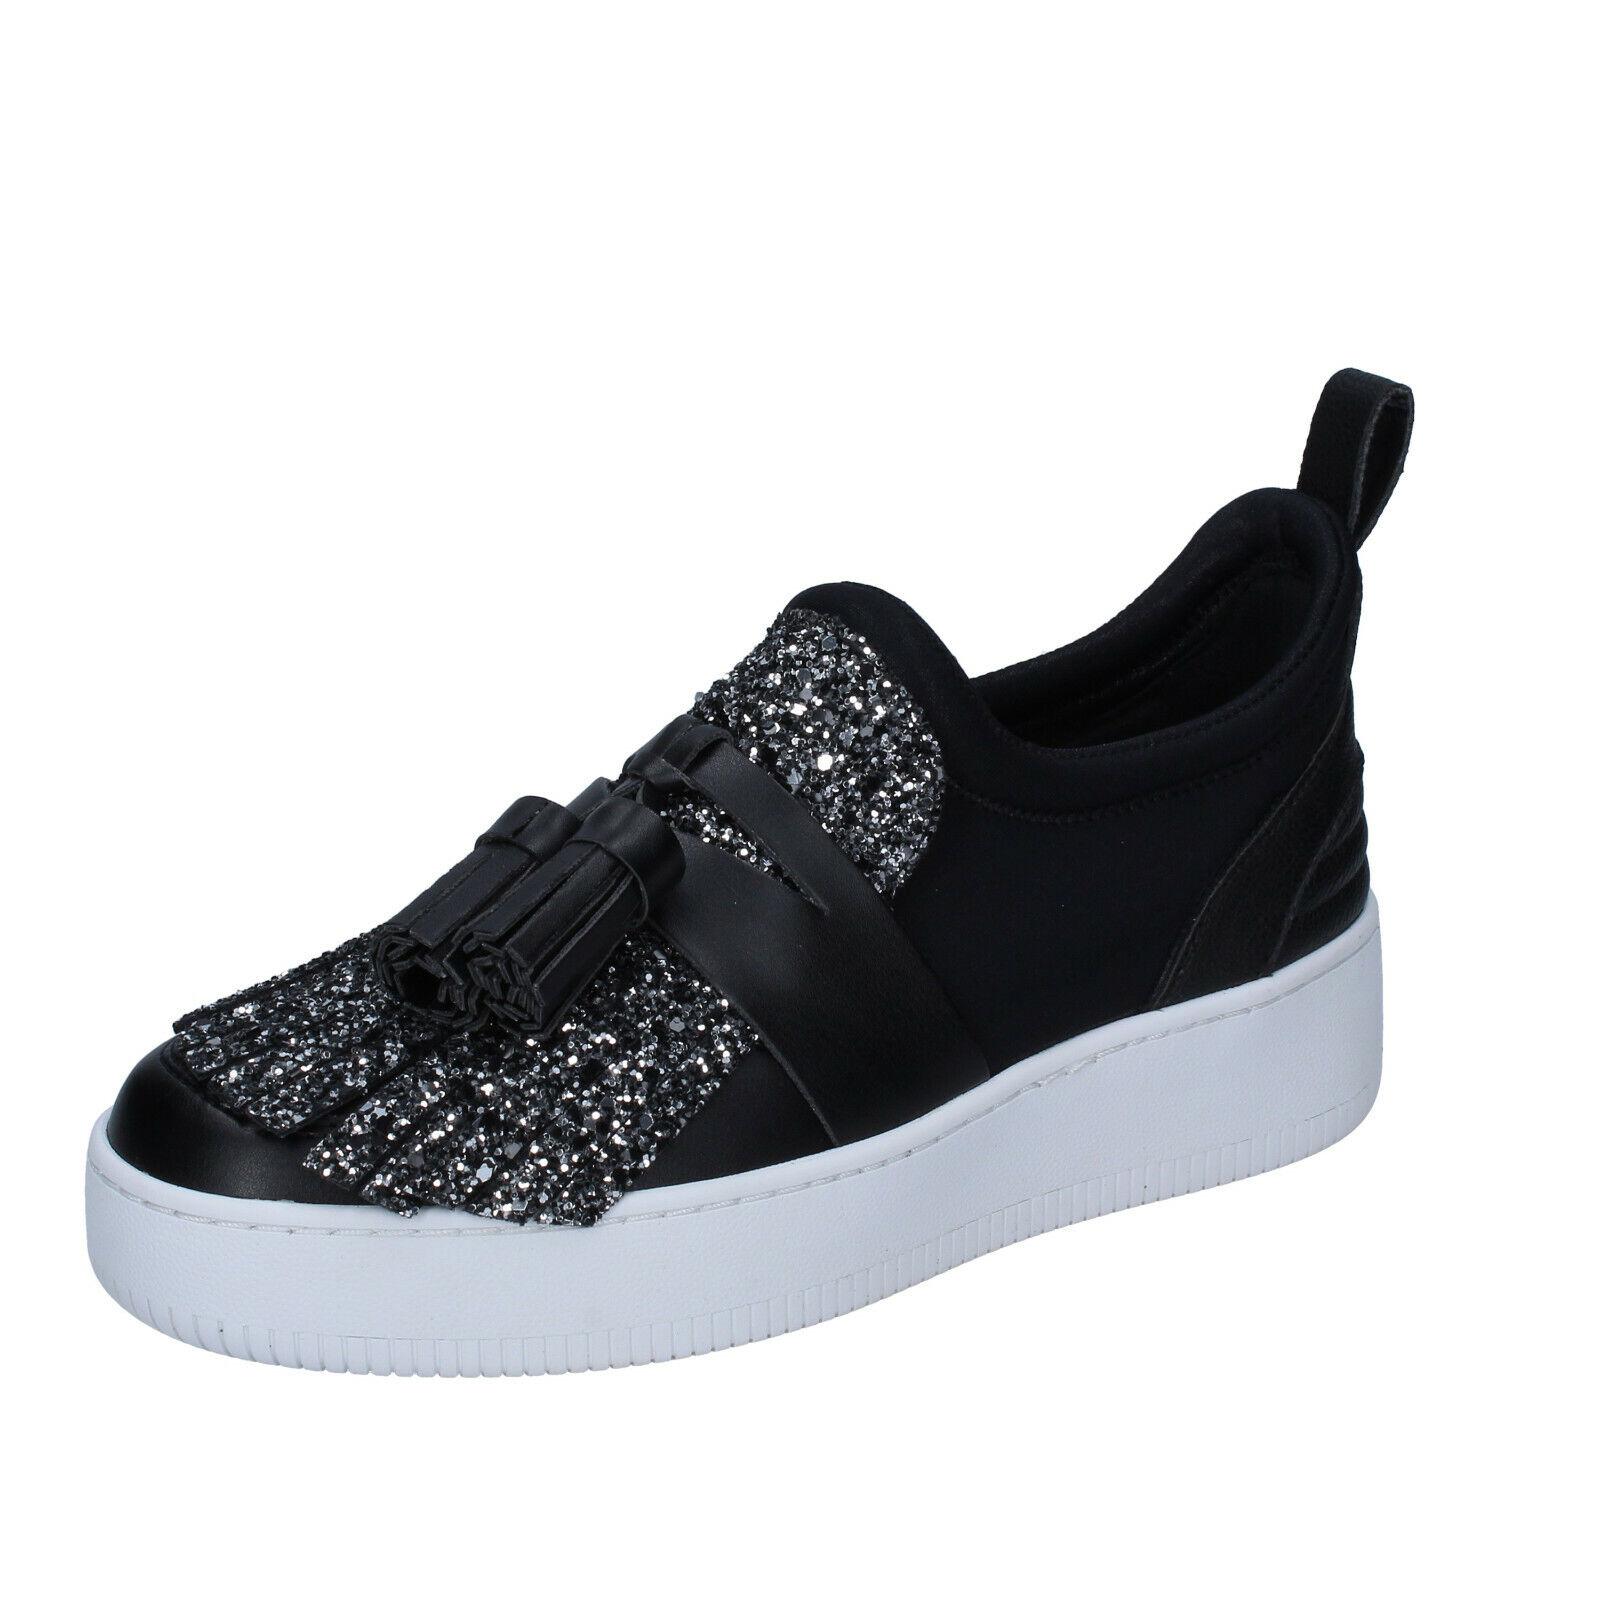 Womens shoes MY GREY MER 5 (EU 38) moccasins silver black glitter BS626-38